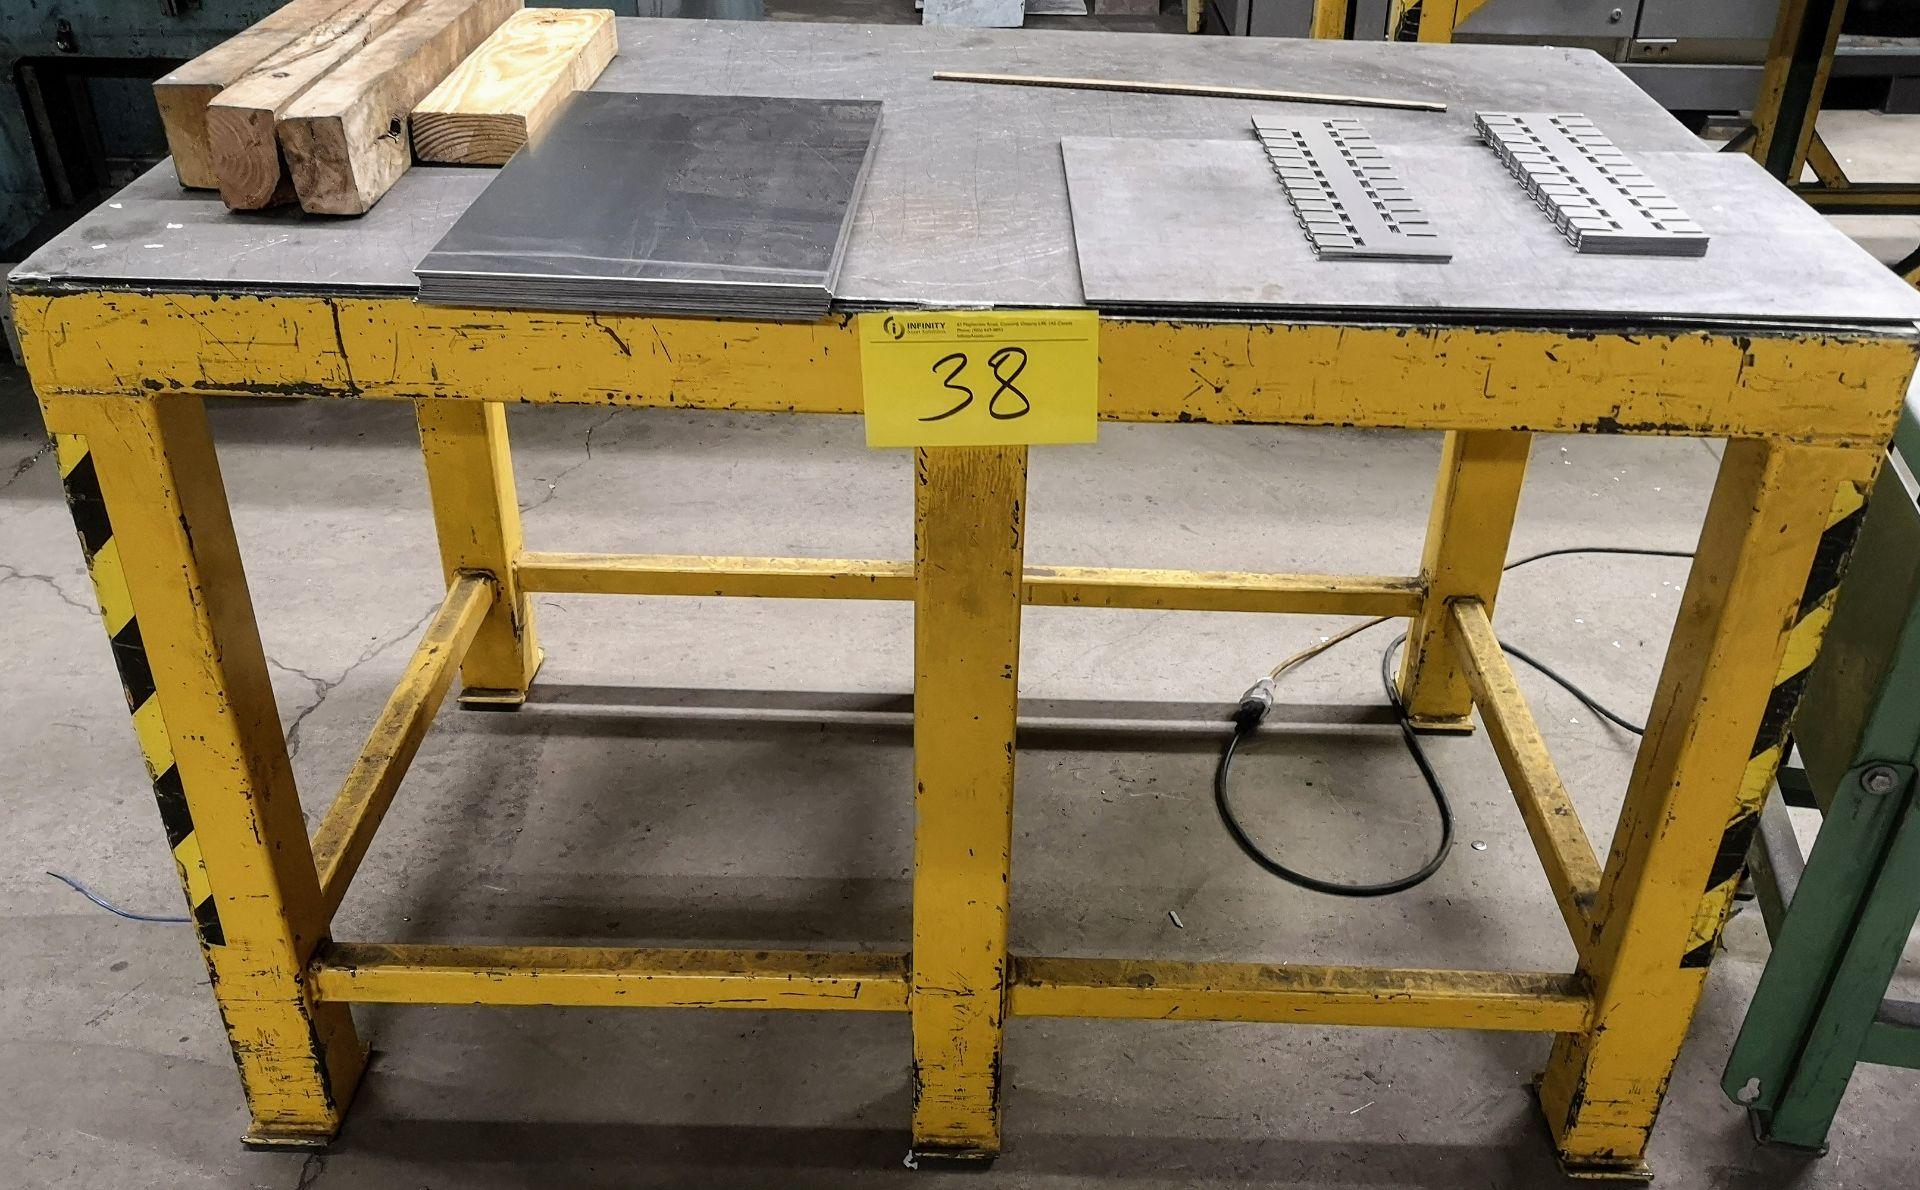 "Lot 38 - 48"" X 30"" X 30"" STEEL WORK TABLE"